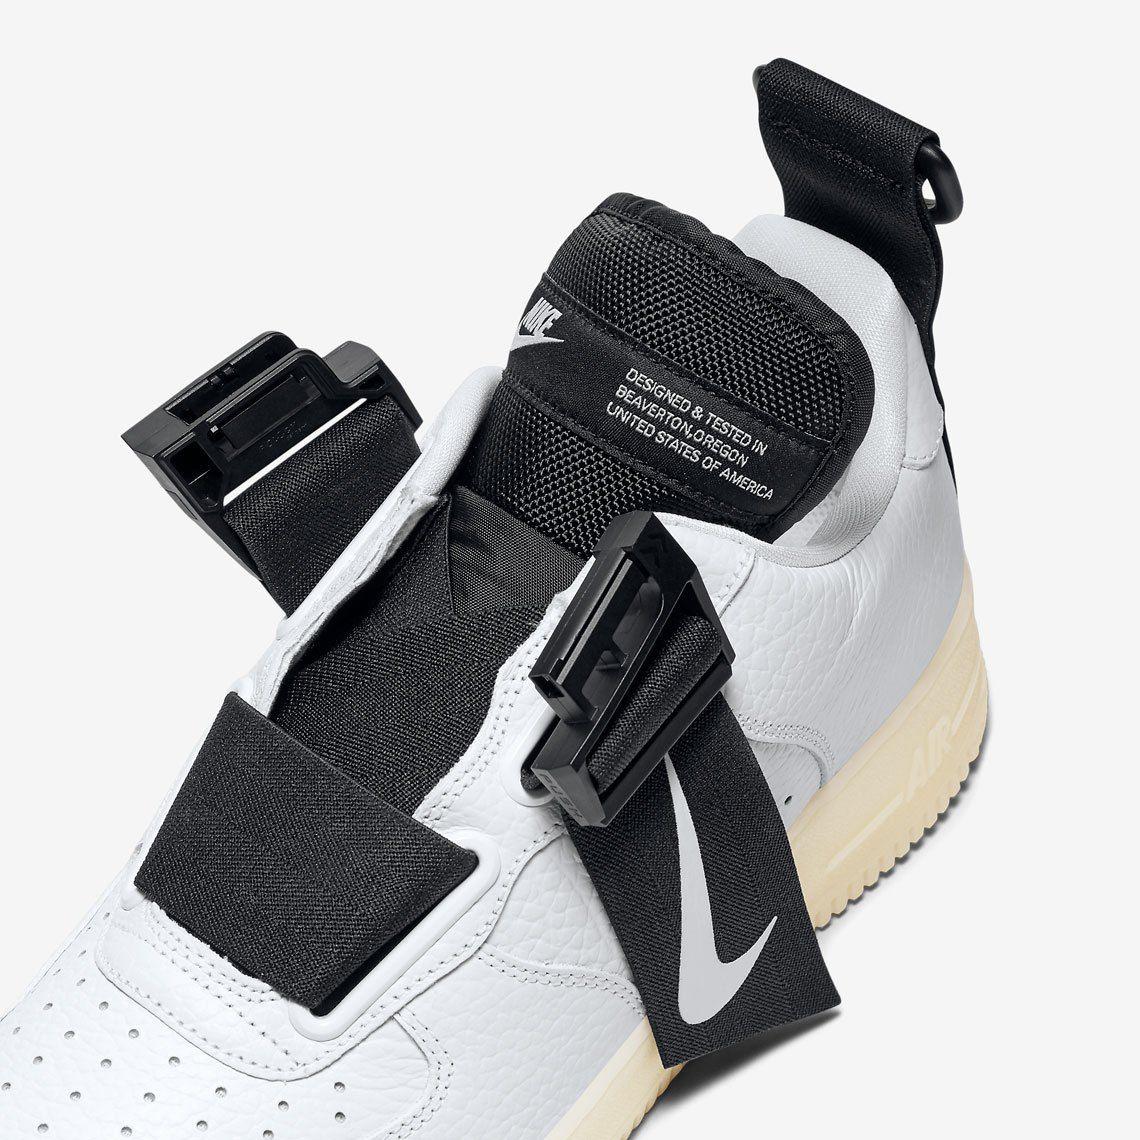 Nike Air Force 1 Low Utility AV6247 100 Release Info | Nike